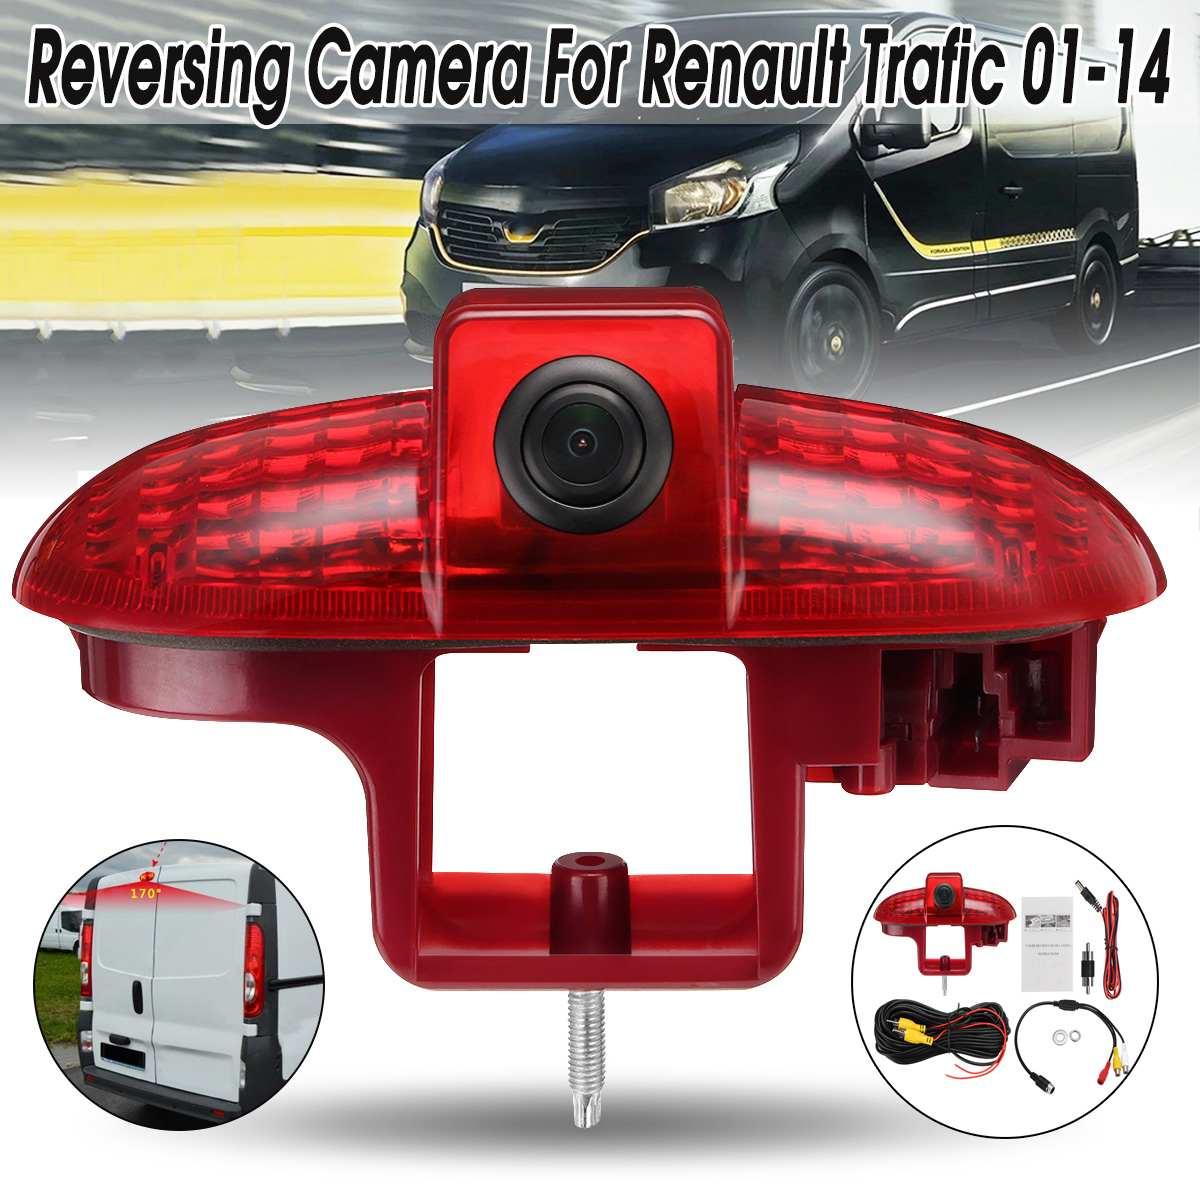 CCD HD Auto Car Rear View Camera Reverse Backup LED Brake Light Night Vision for Renault Trafic 2001-2014 Trafic Vauxhall Vivaro